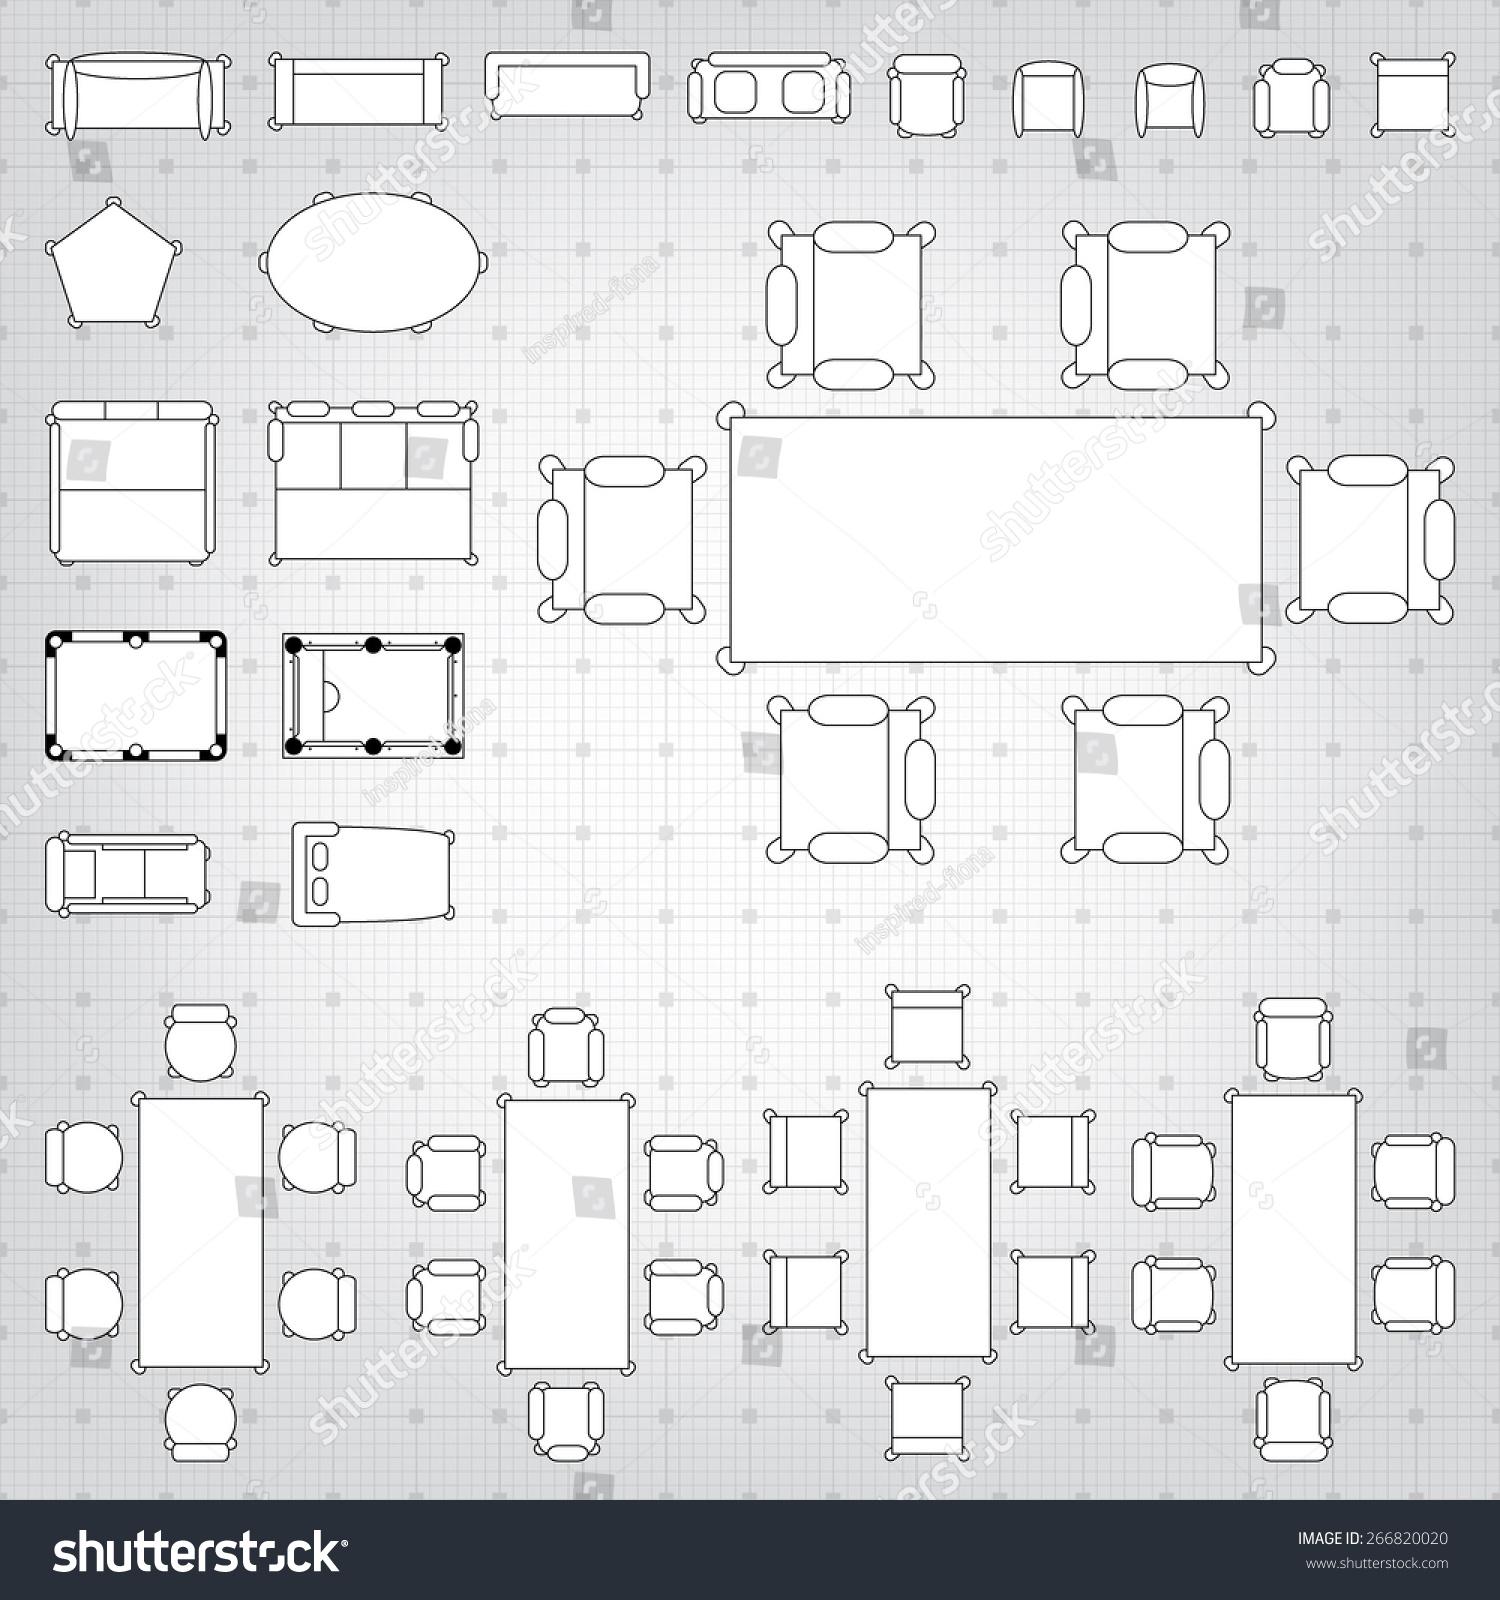 Blueprint Interior Design Set royaltyfree set of simple 2d flat vector icons… 266820020 stock